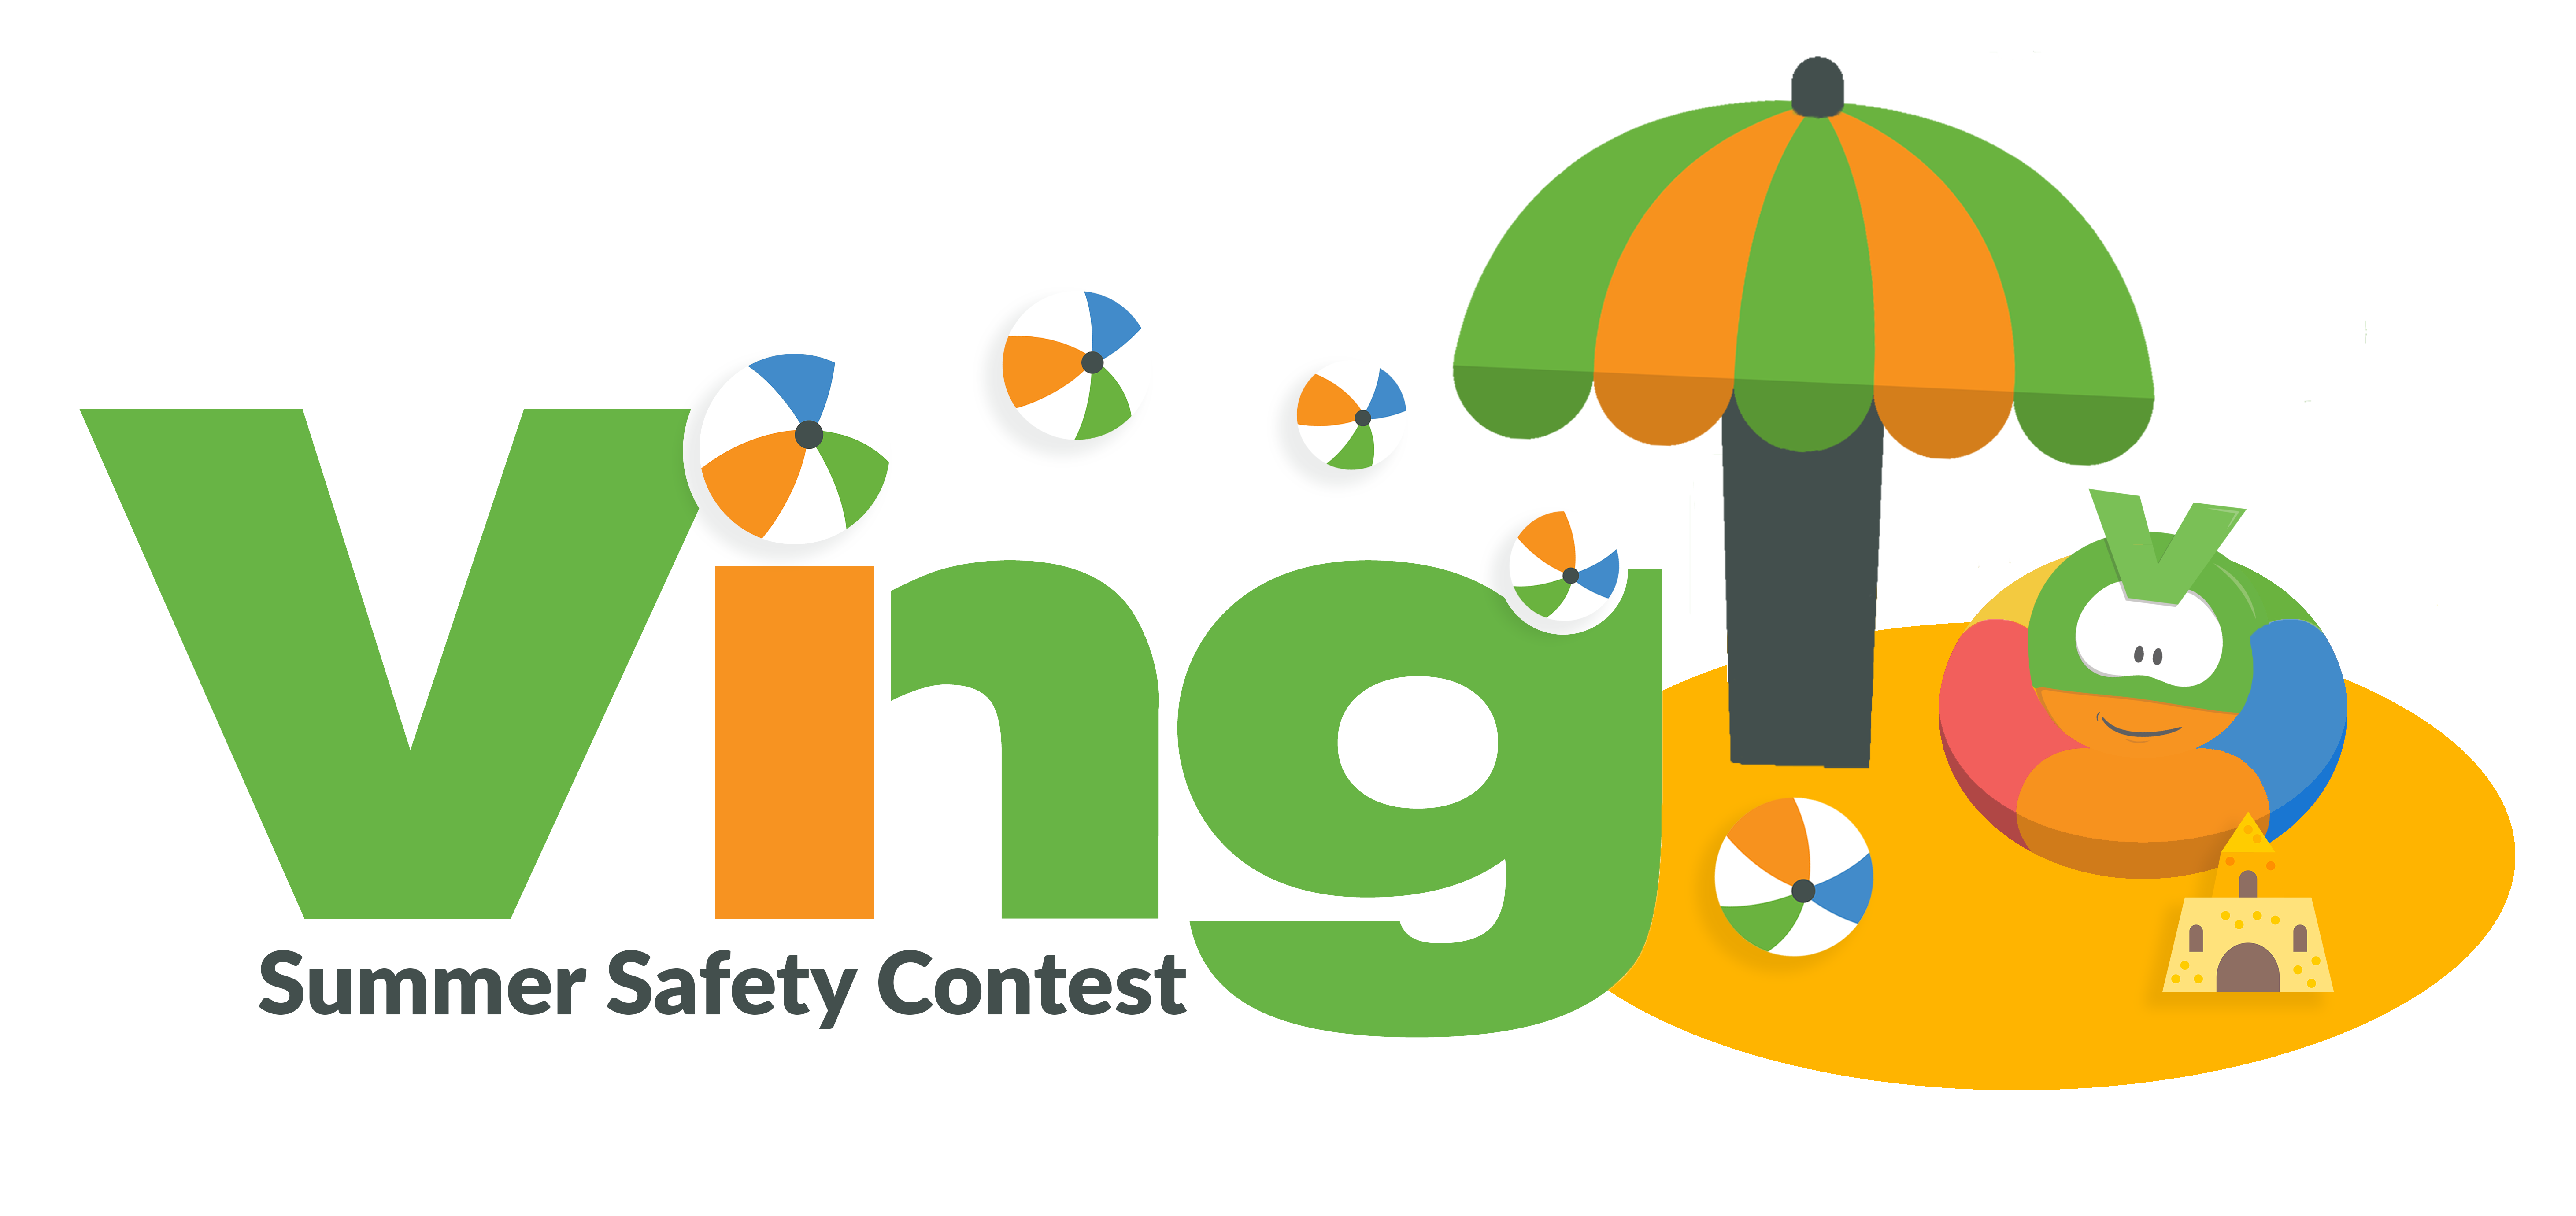 summer safety contest logo